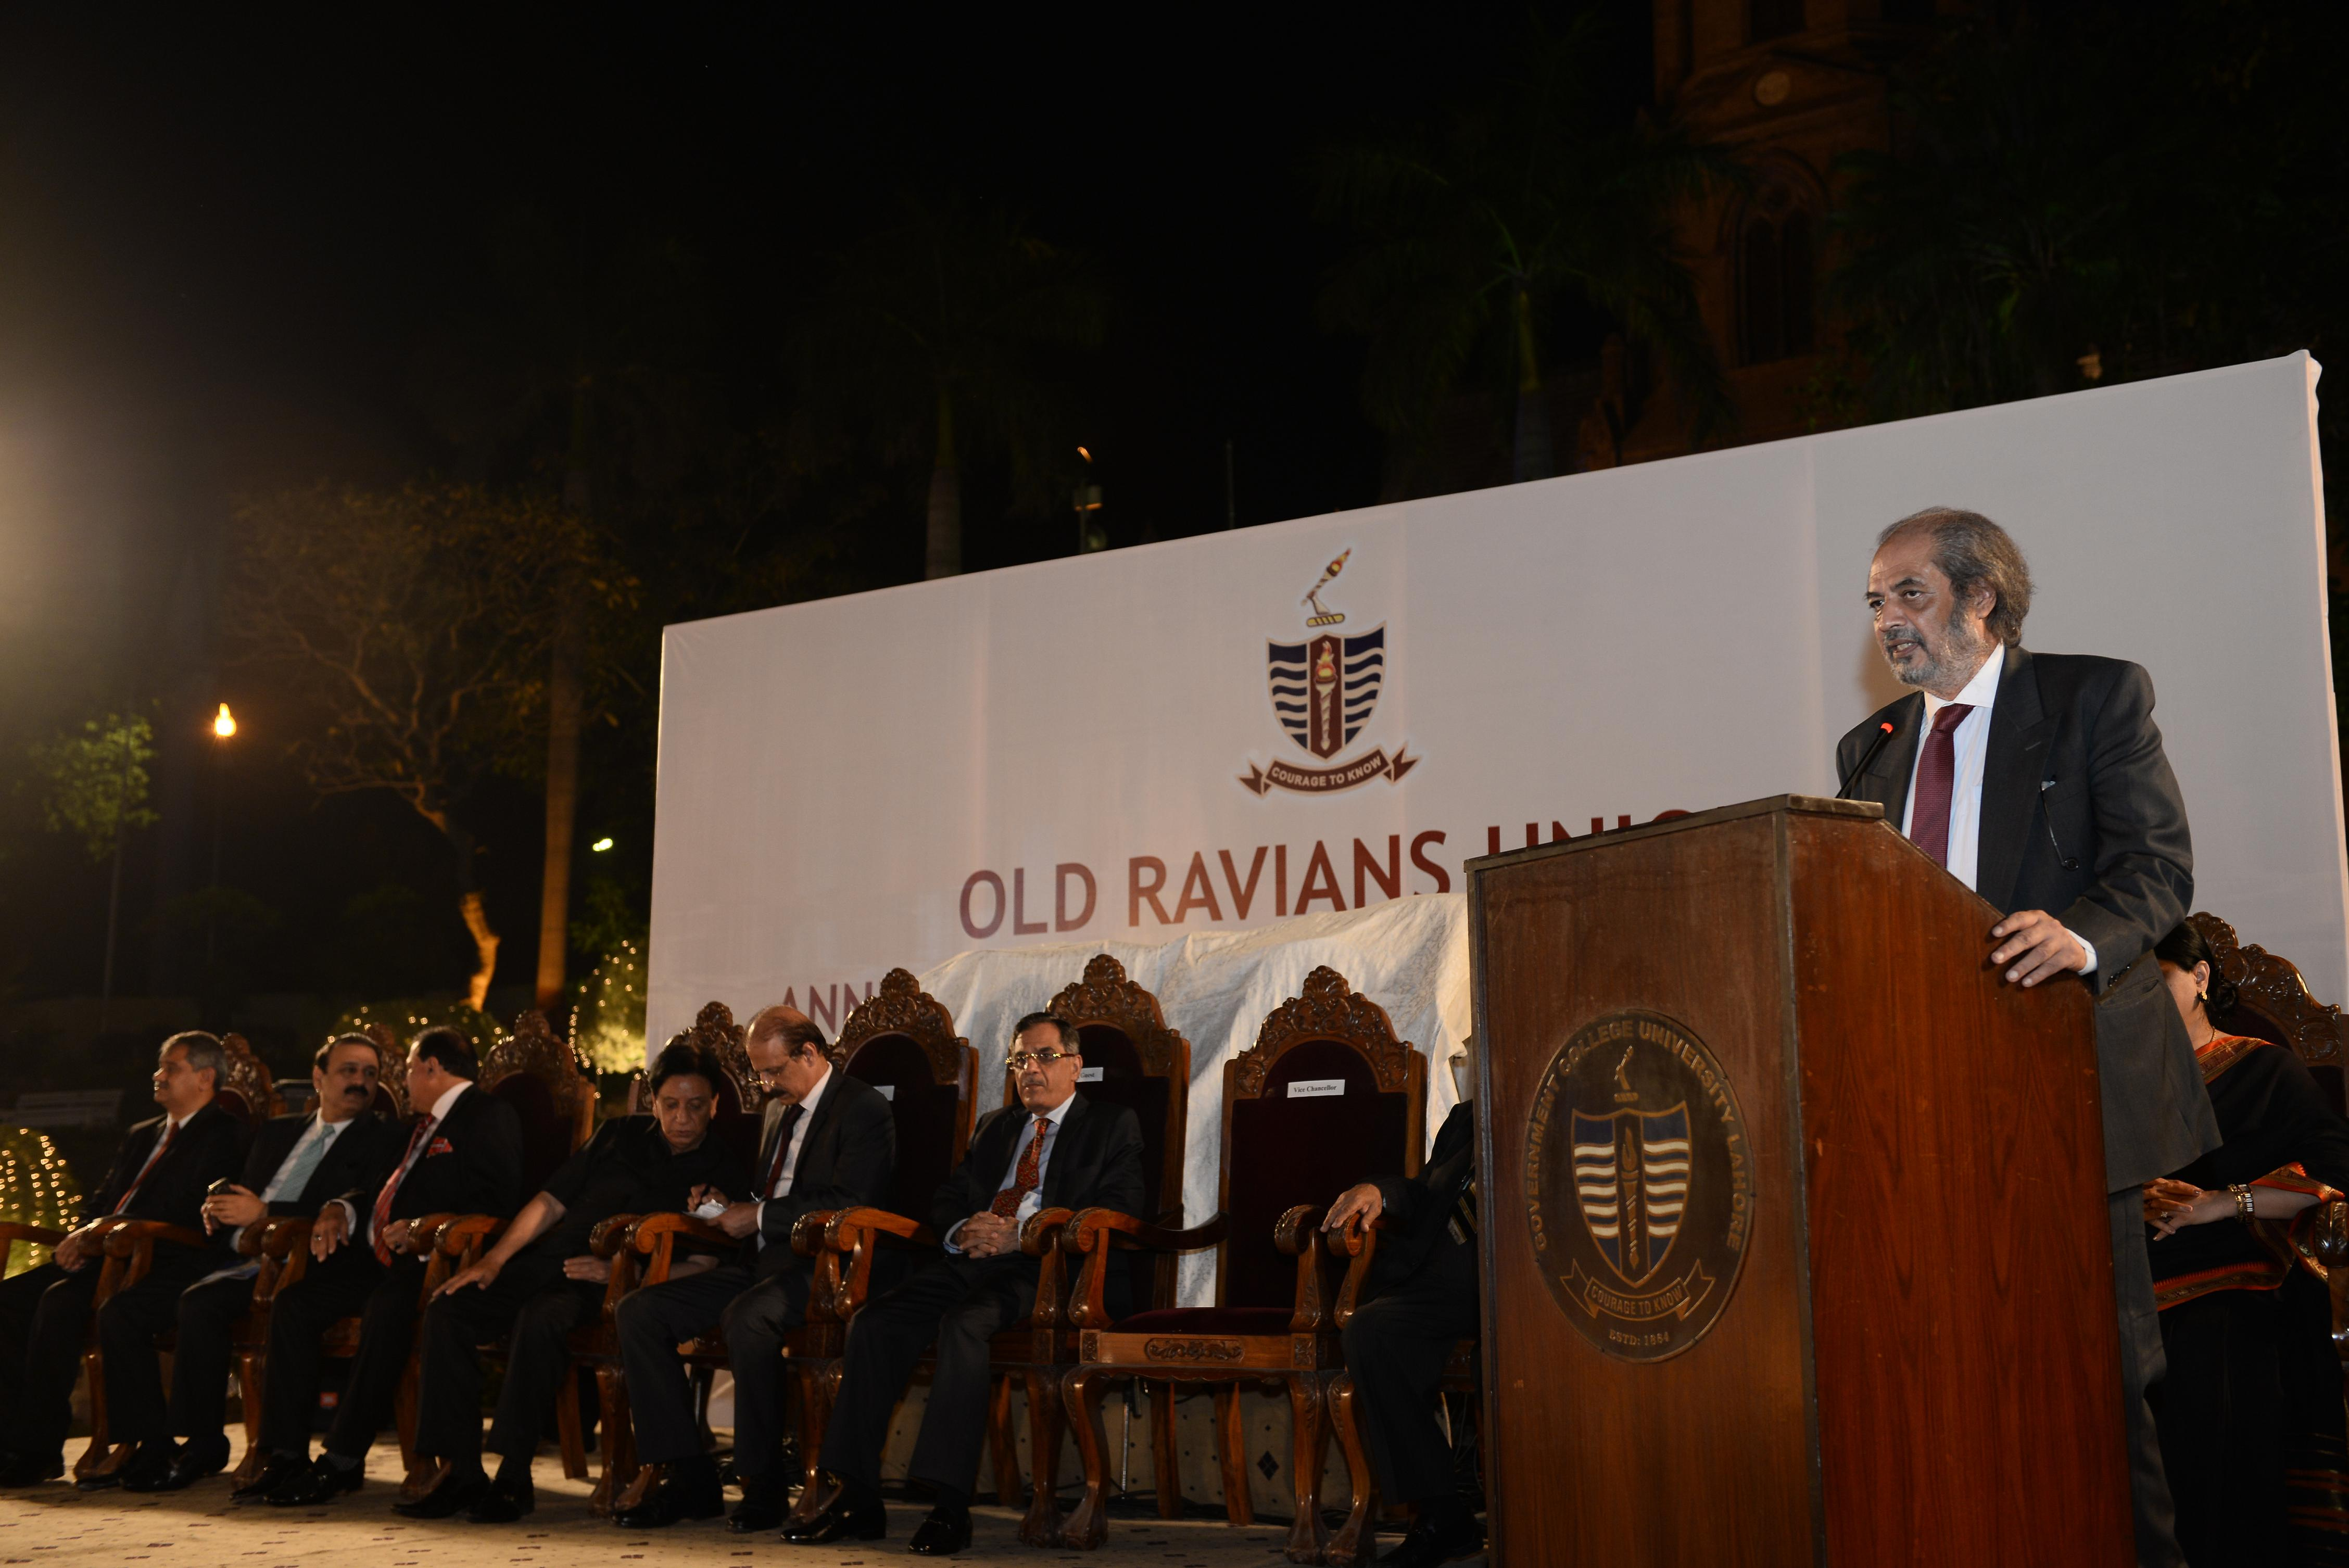 Speech by Dr. Hassan Amir Shah (VC)